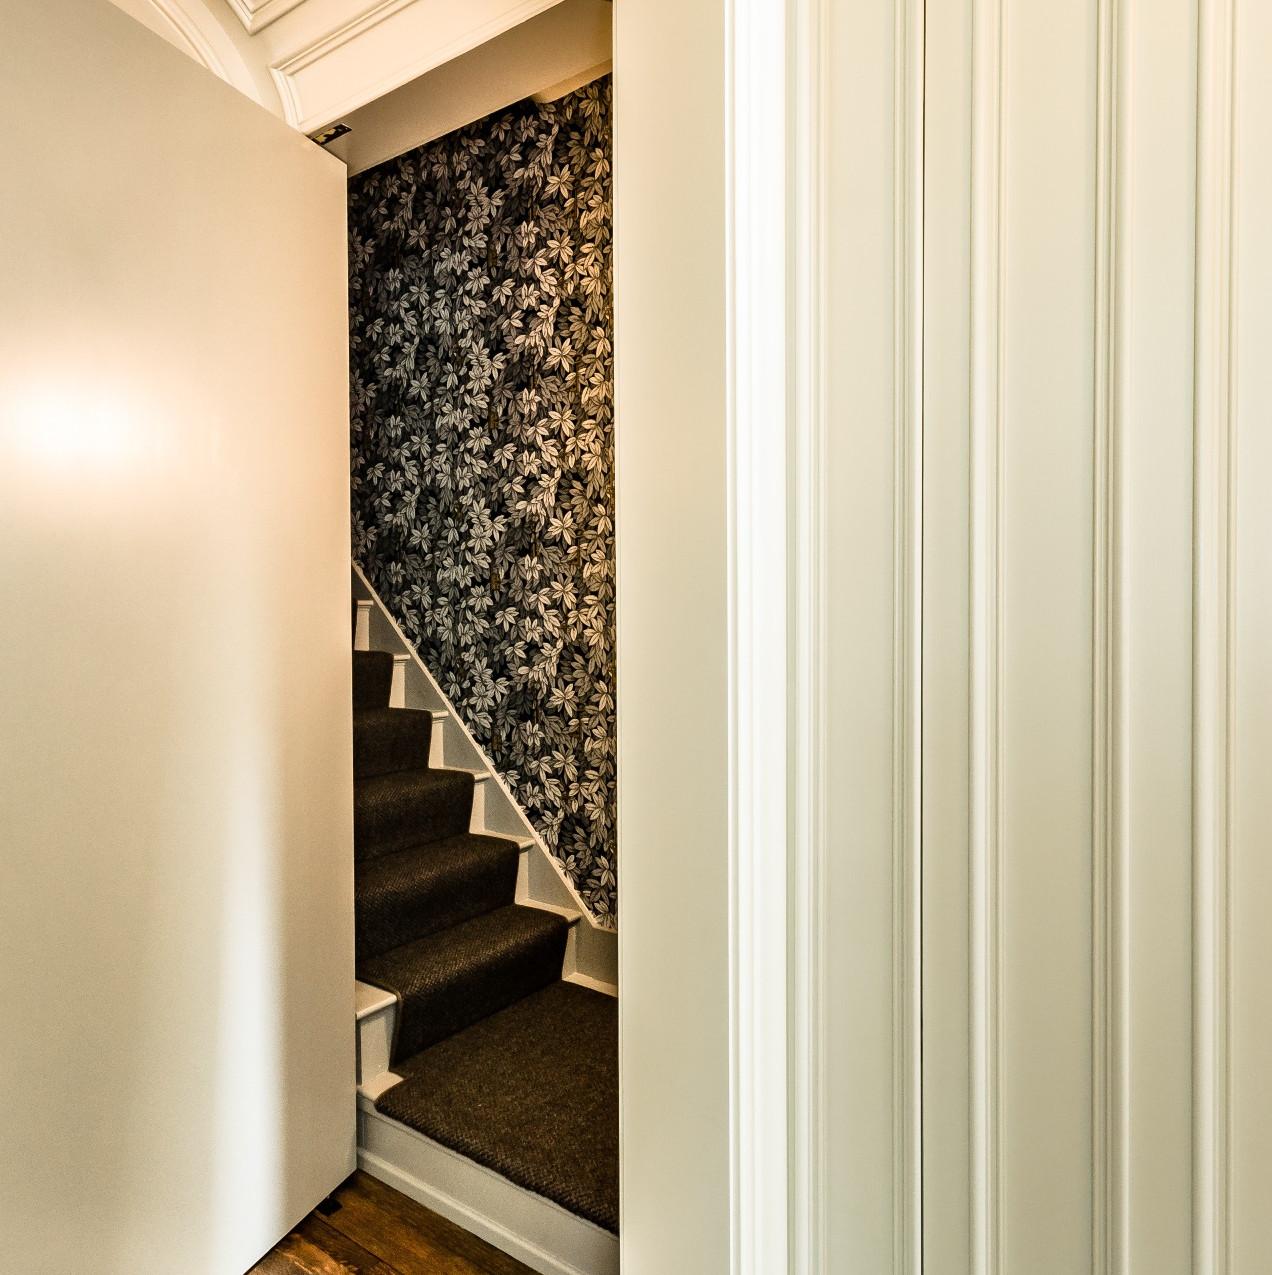 secret stairway entrance